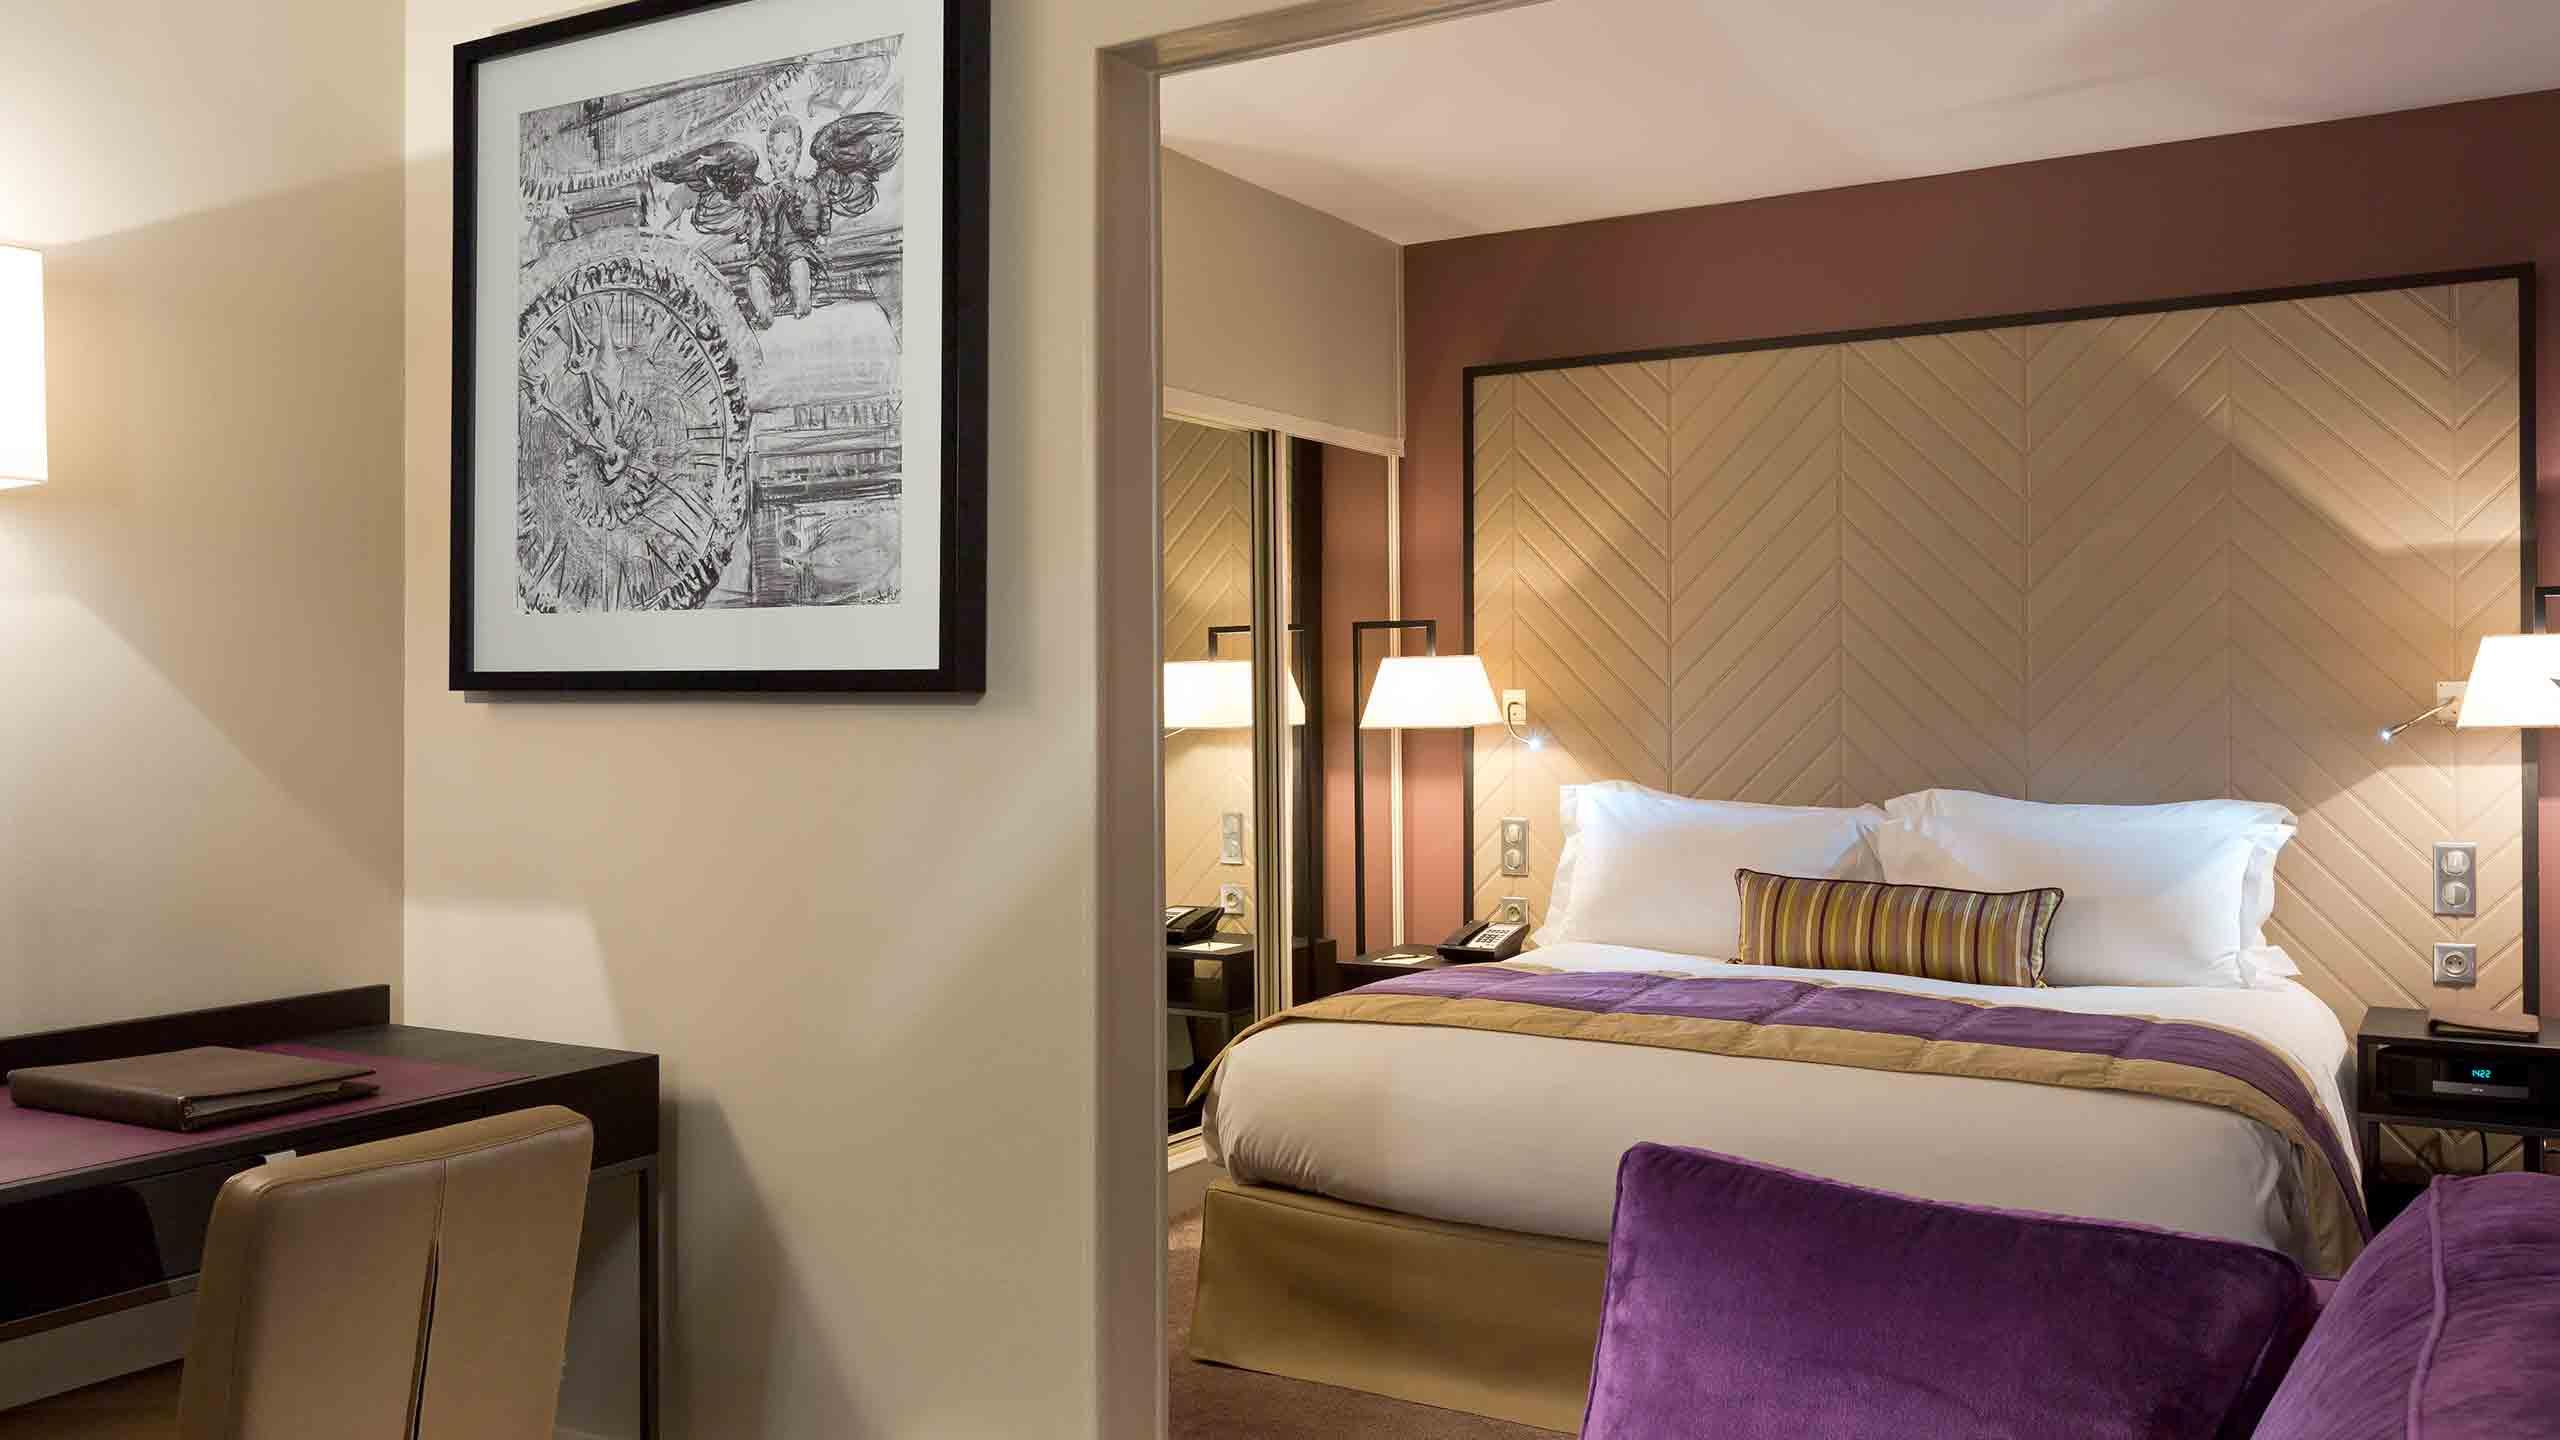 Hotel de luxe STRASBOURG – Sofitel Strasbourg Grande Ile